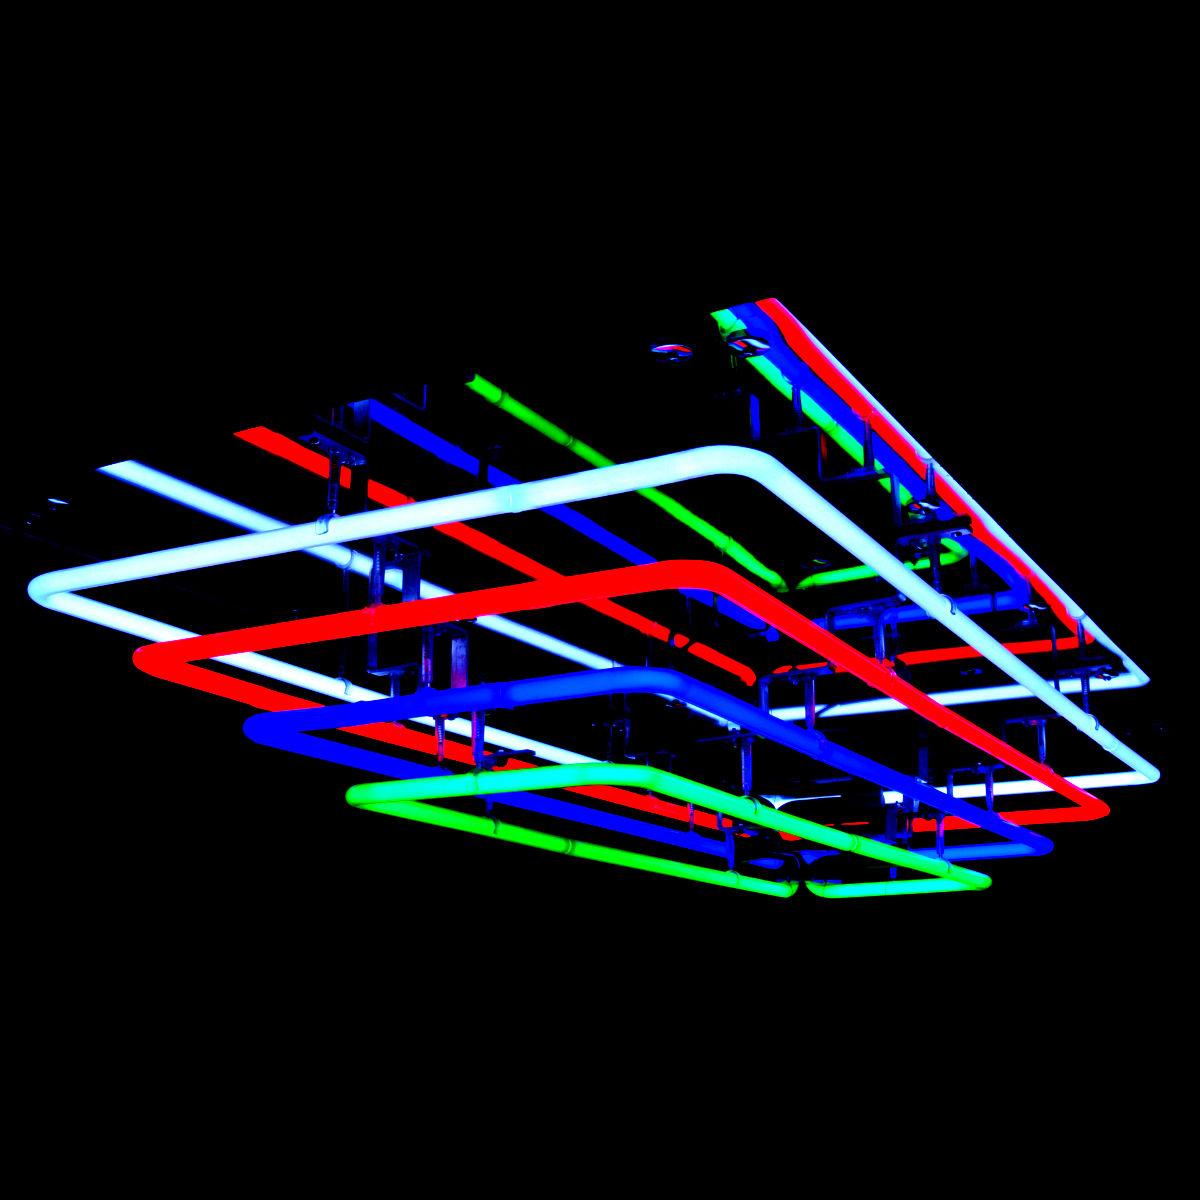 Stunning Custom Neon Light Fixtures by John Barton - Famous USA Neon Glass Artist - BartonNeonMagic.com